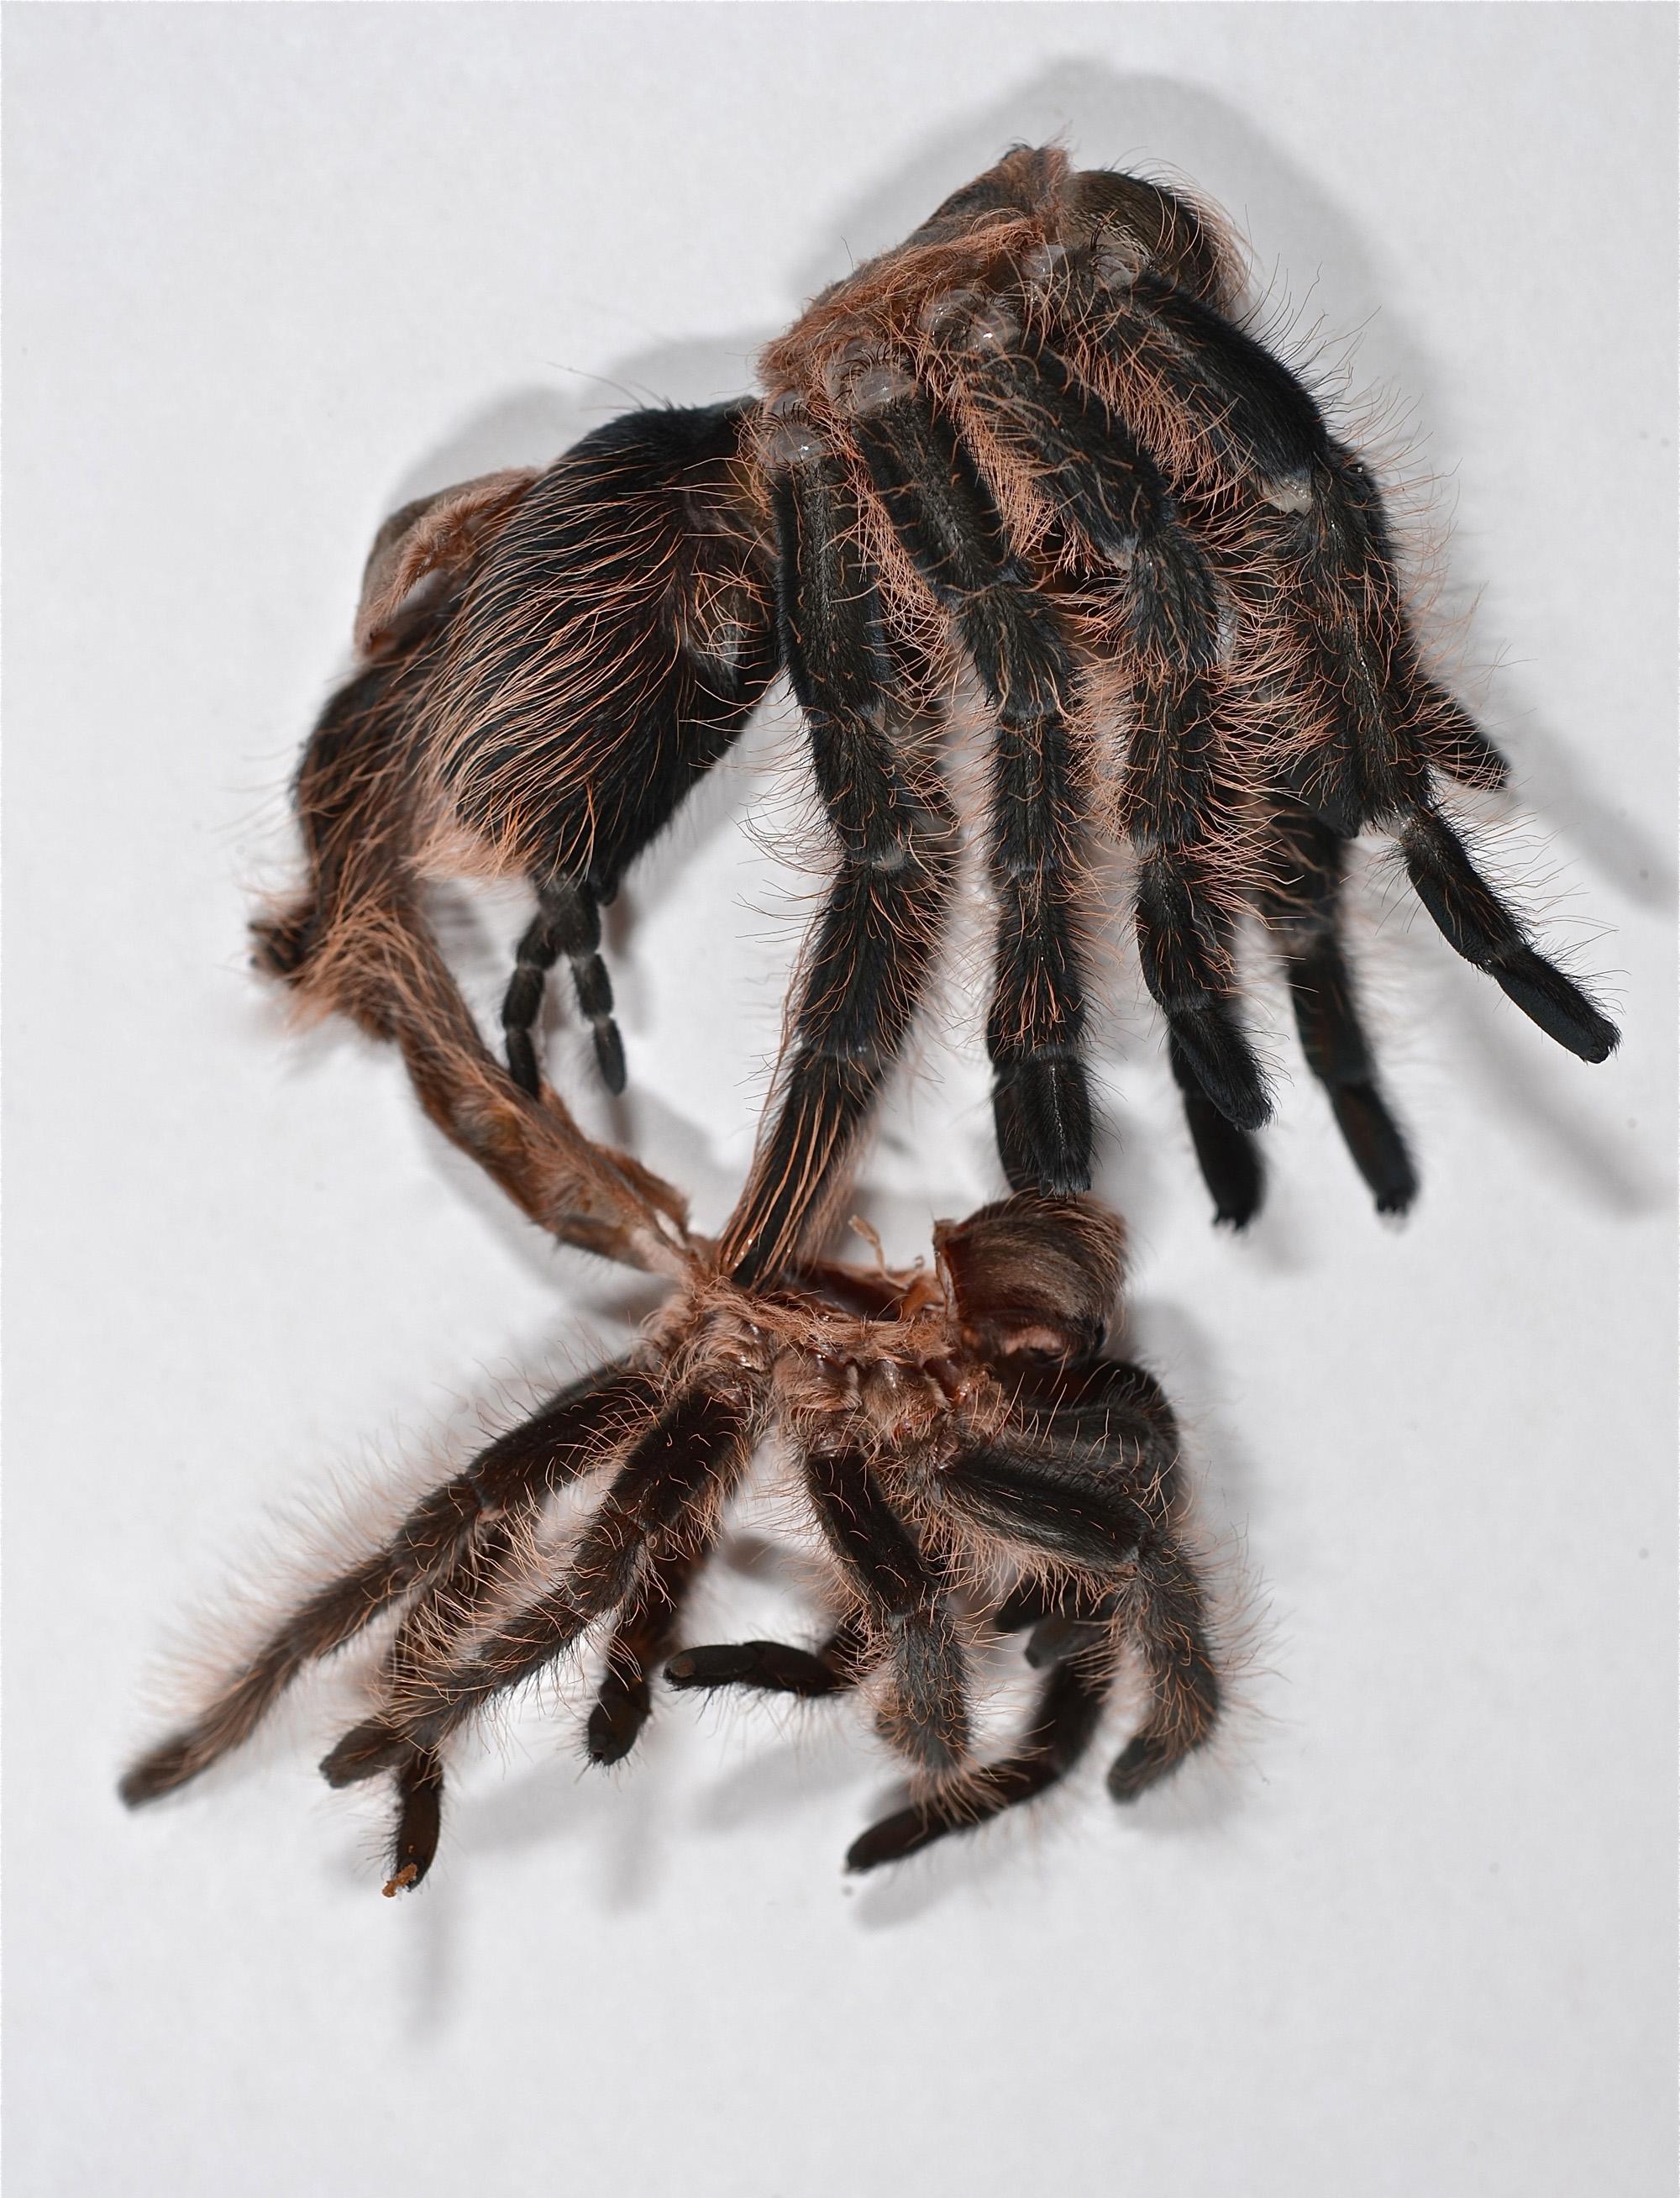 I hallucinated a tarantula writhing on top of my dresser